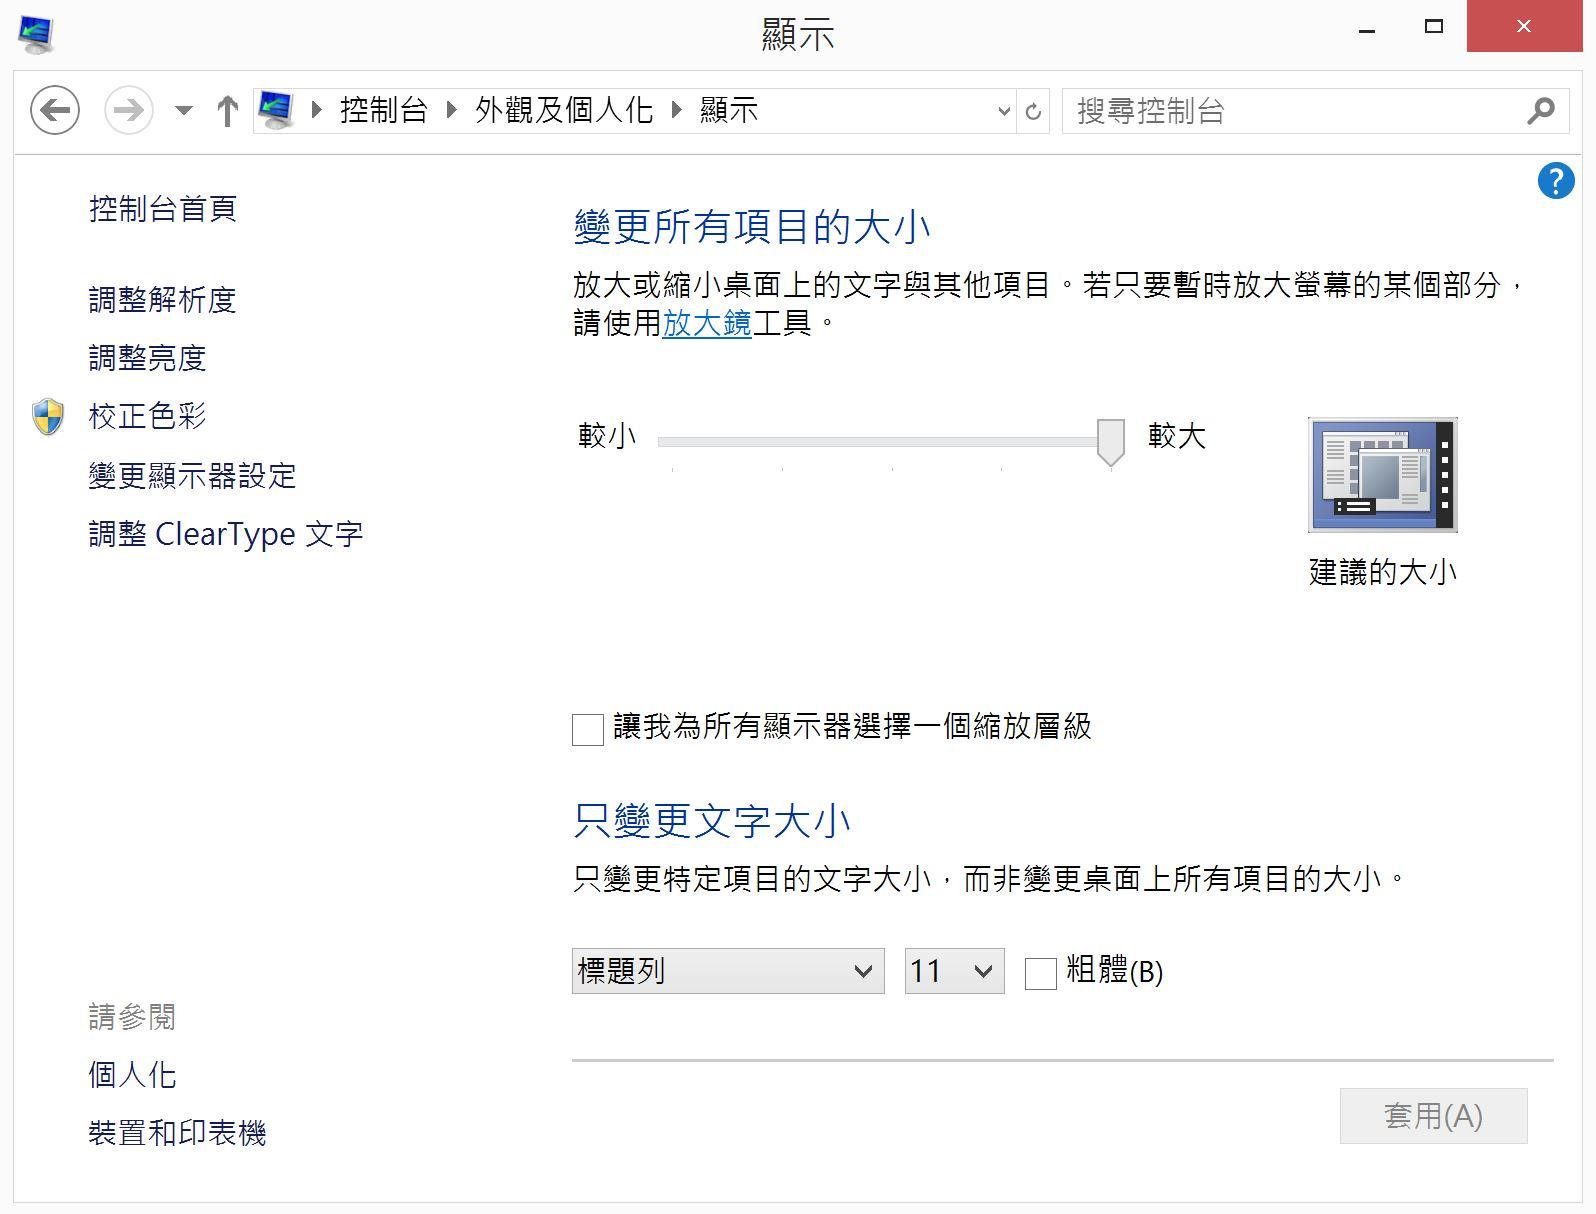 [XF] 藝展才貌風華 輕薄Zen意世代 ASUS ZenBook UX305 筆電評測